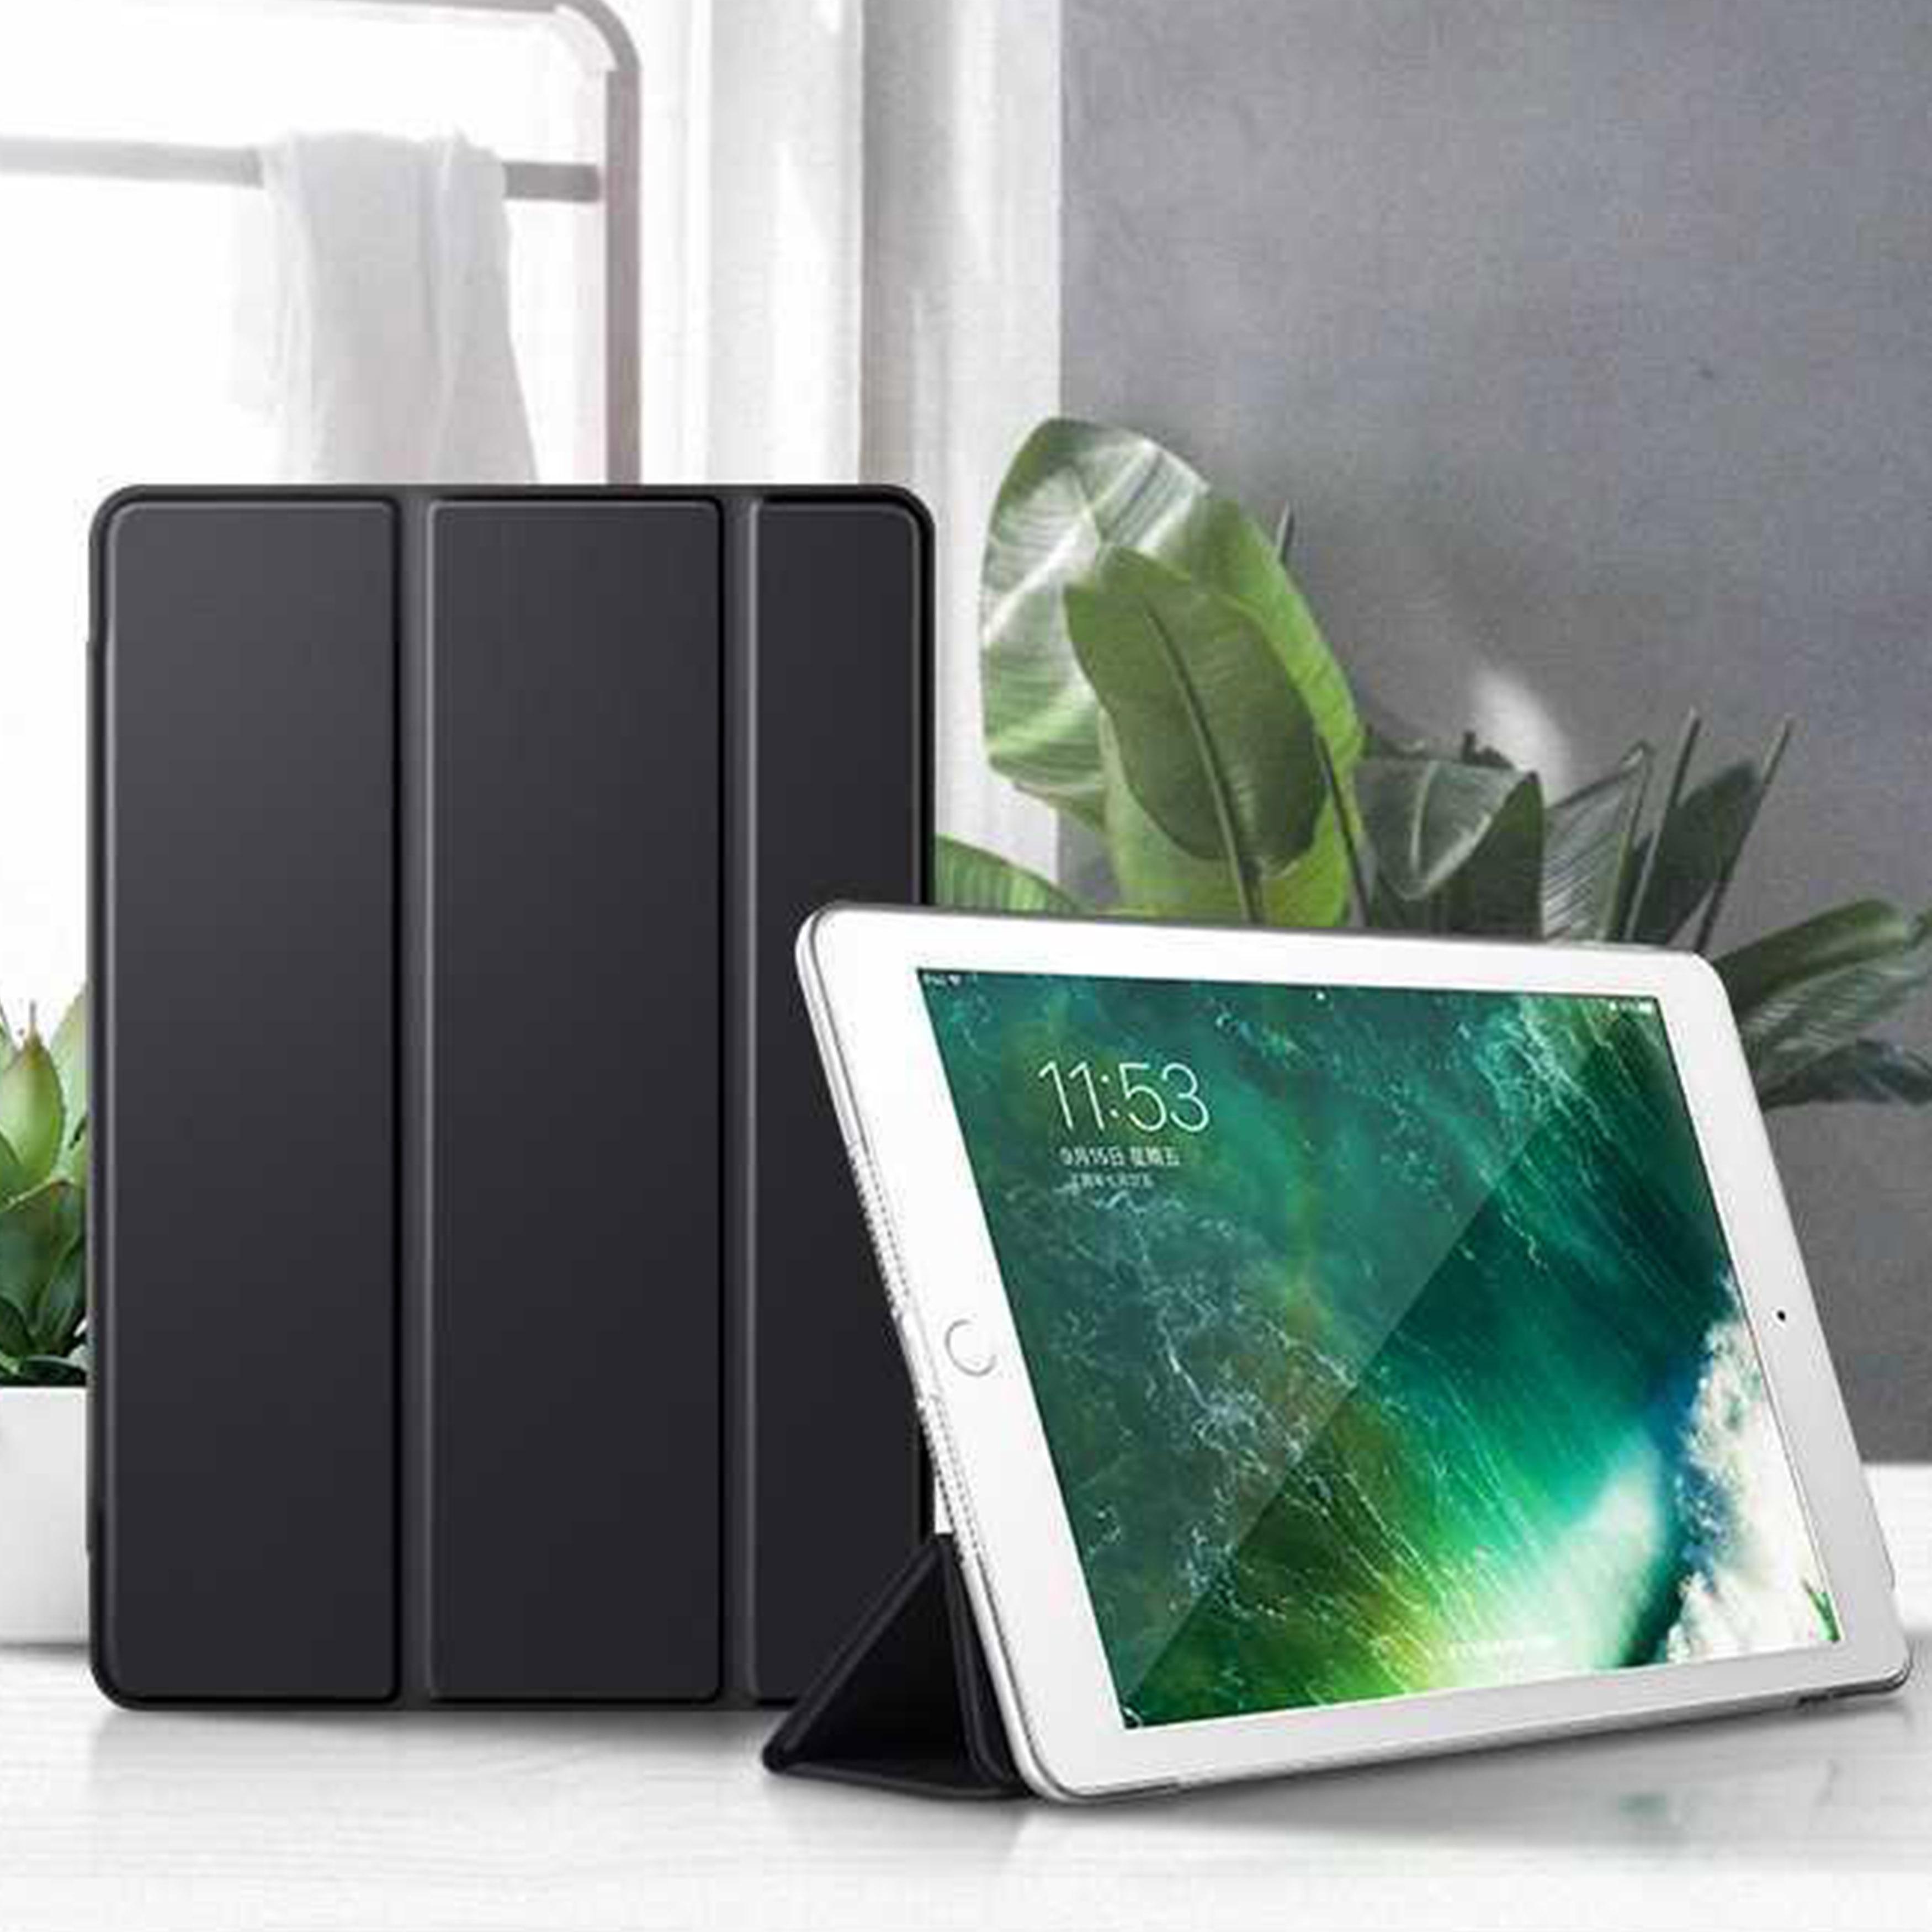 Case For Samsung Galaxy Tab A T550 T555 SM-T550 SM-T555 9.7\